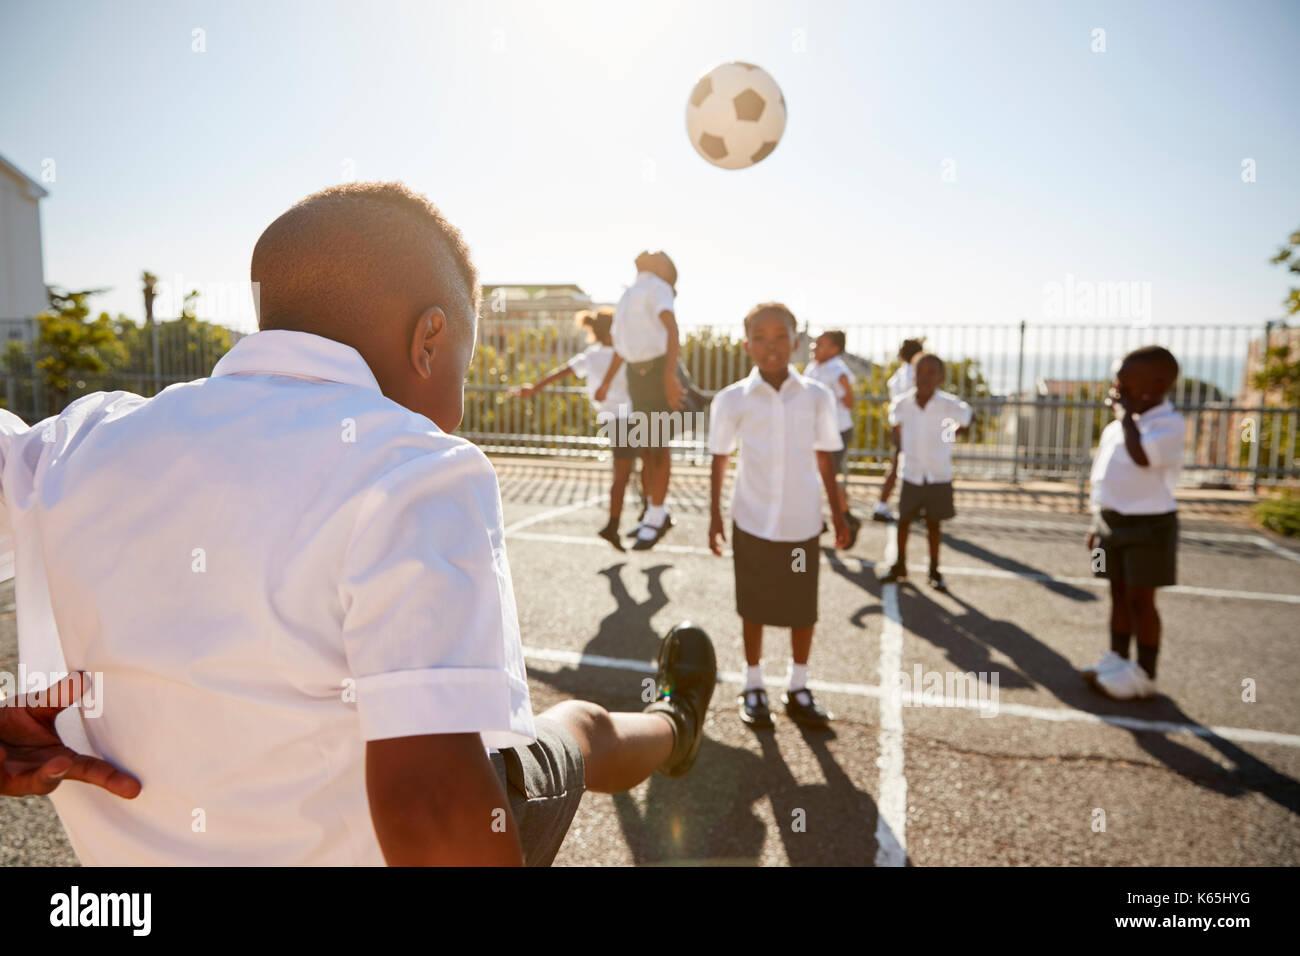 Boy kicking ball to classmates in elementary school playground - Stock Image